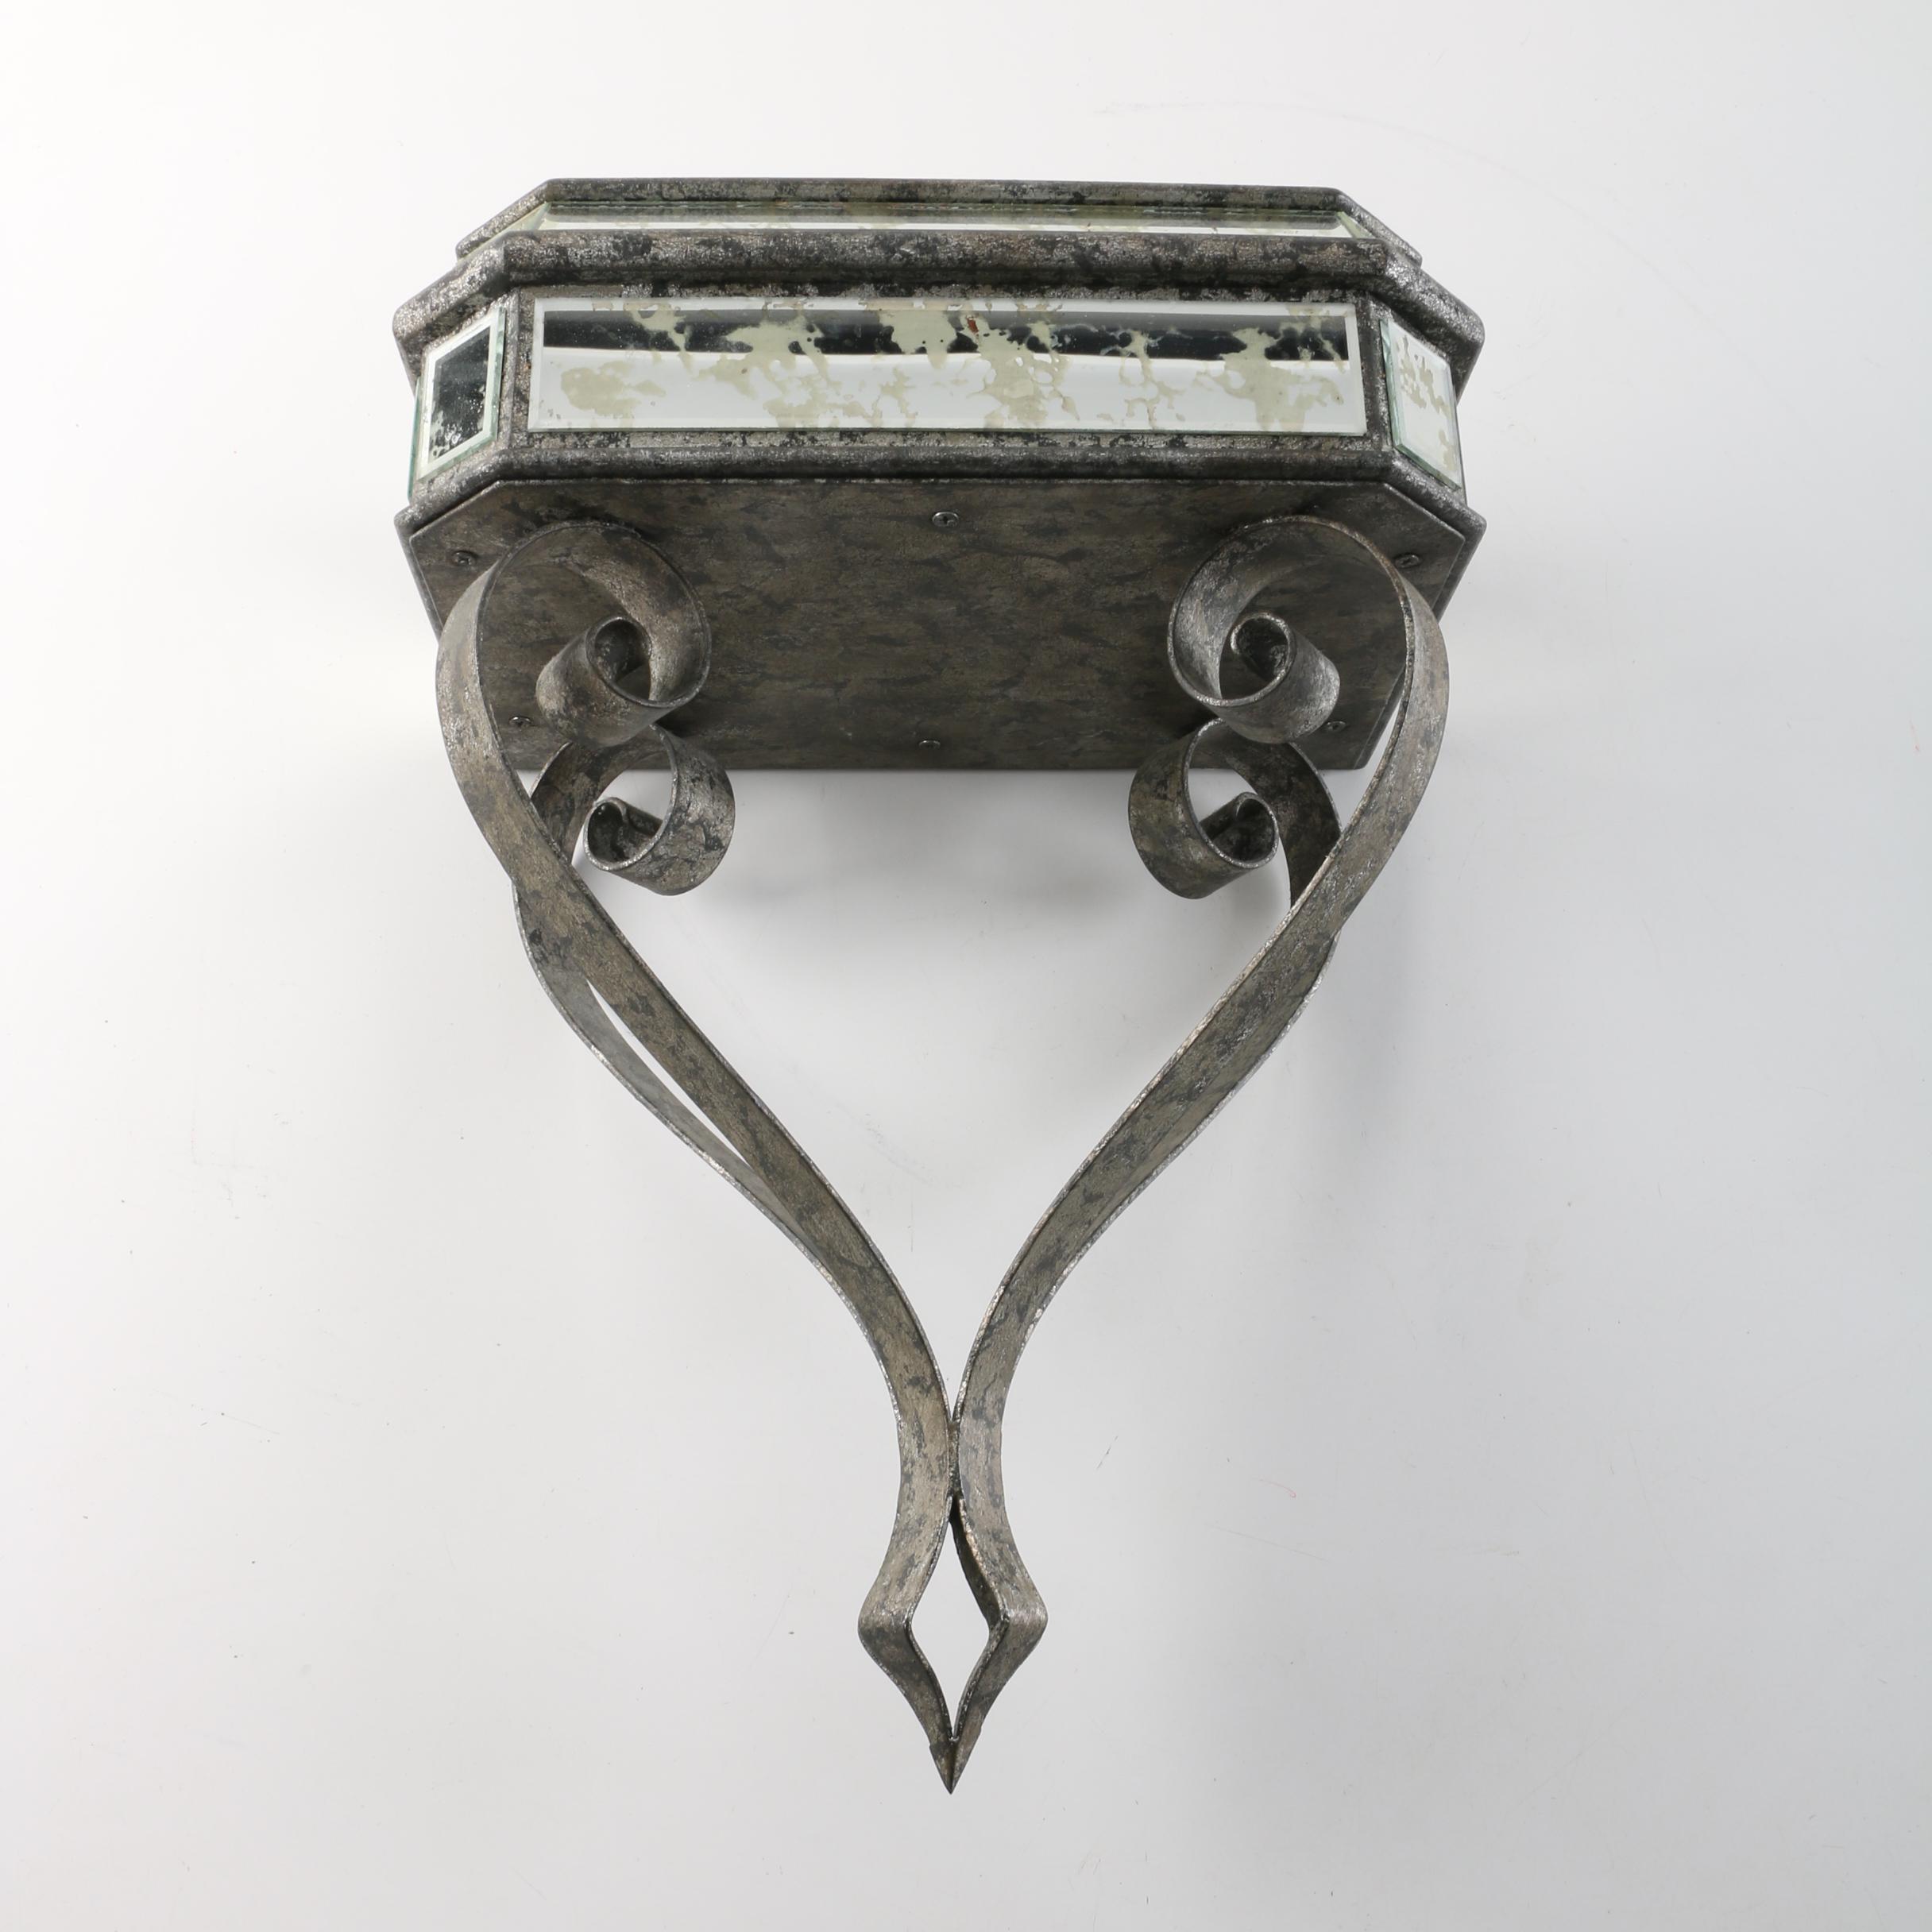 Hanging Metal and Glass Wall Shelf